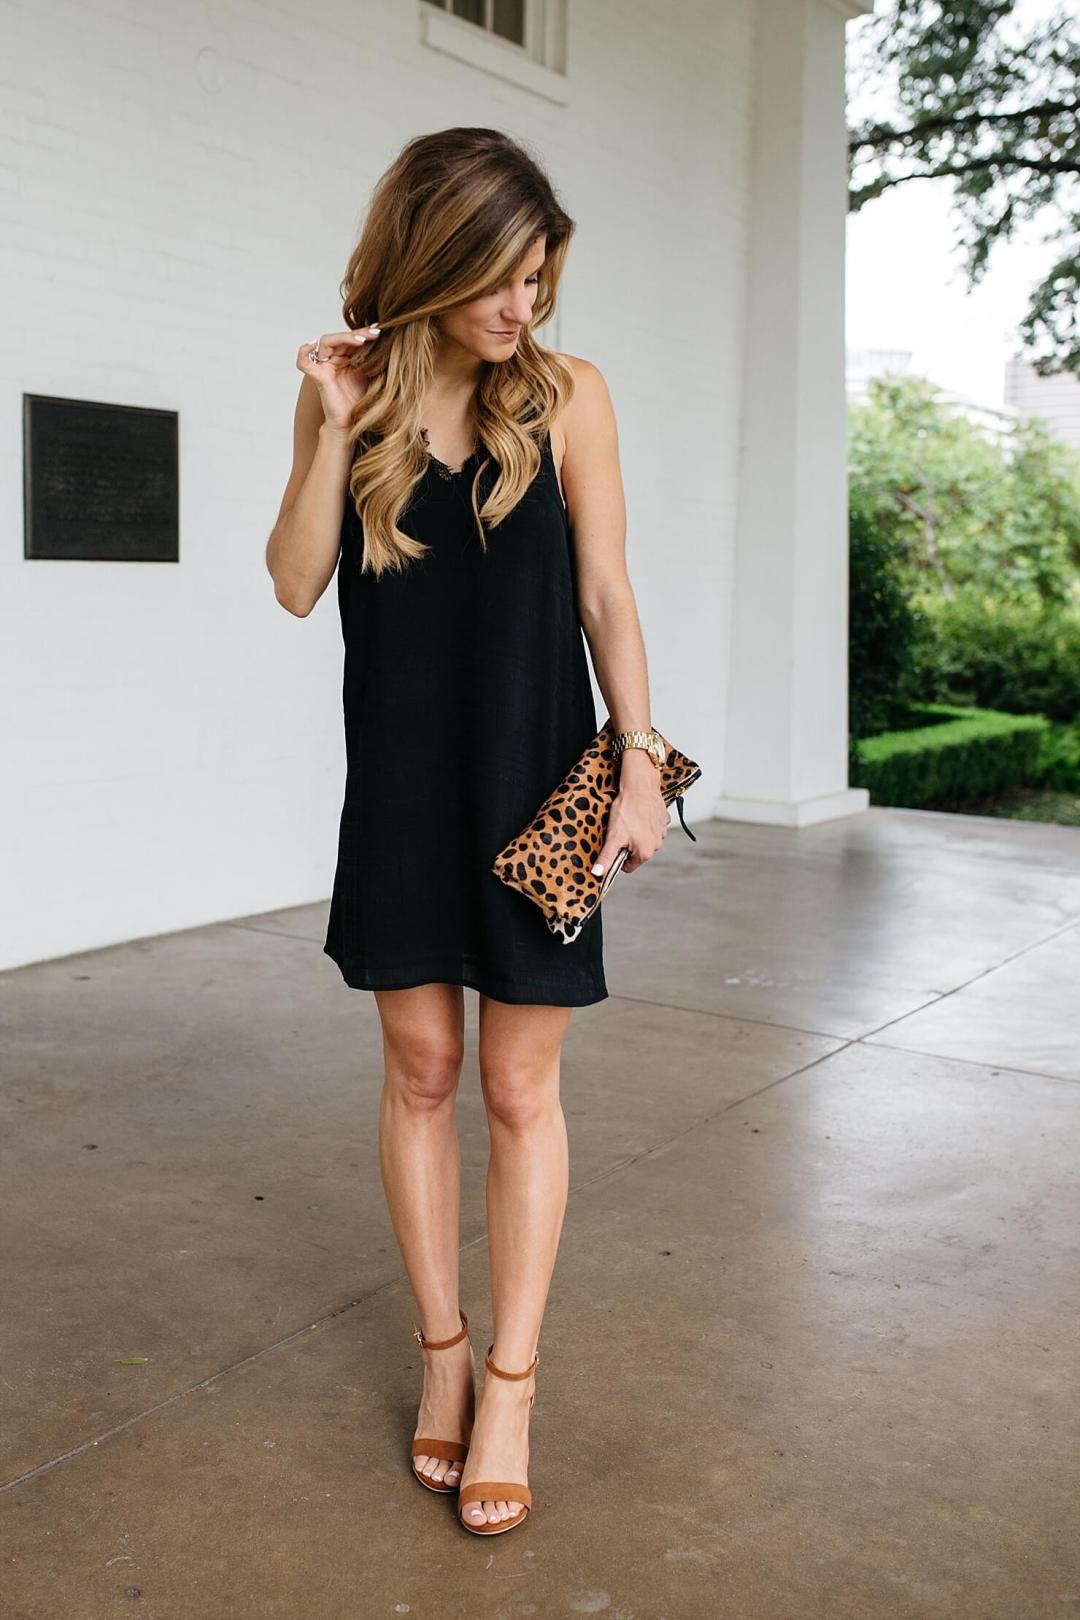 brighton keller hair extensions blog post wearing black lace trim slip dress, brown heels, leopard clutch, simple summer night time outfit